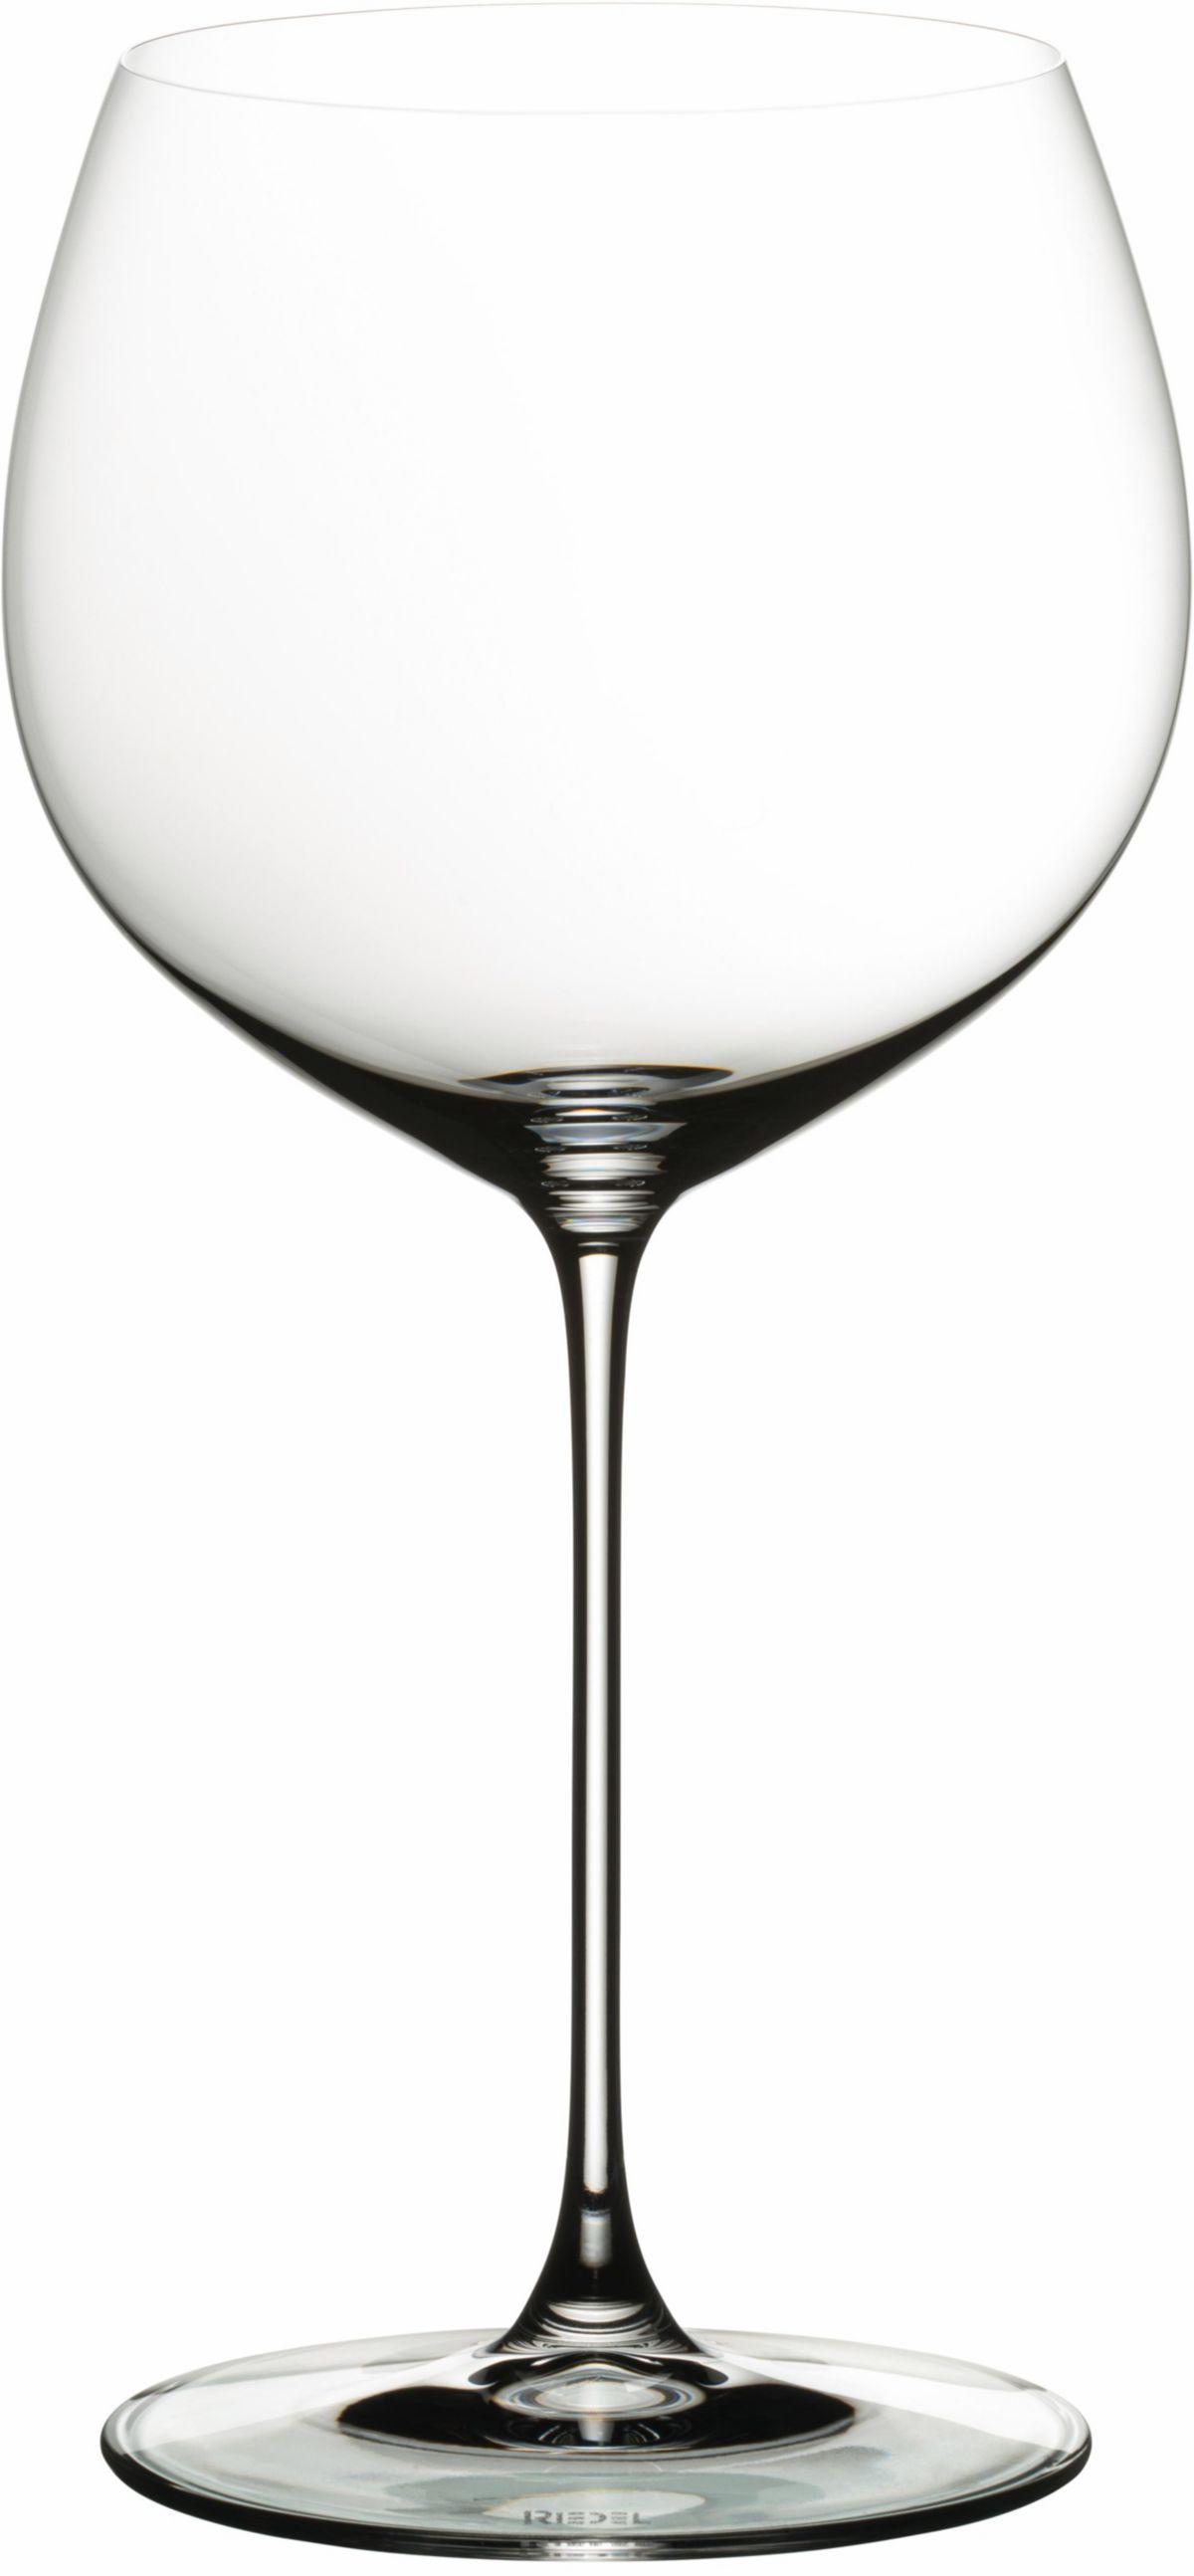 RIEDEL GLASS Wein-Glas, Oaked Chardonnay, 2er S...